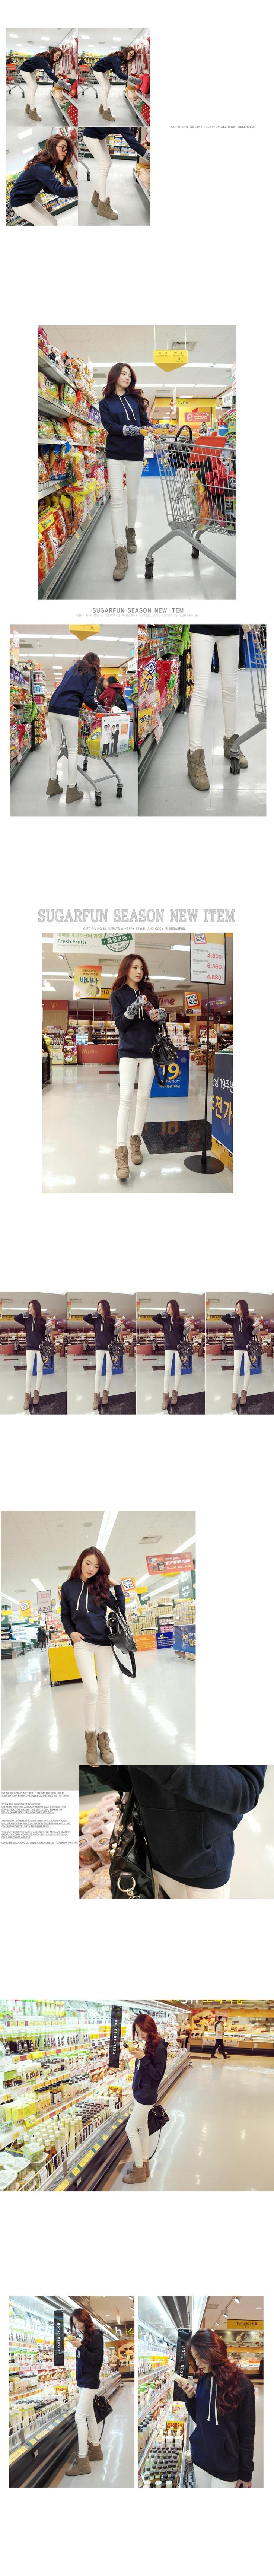 Jual jeans Korea Buy Sell Authentic Korean Skirt Fashion Online Sugarfun Skinny Jeans LFBTM_078_1259 $43 #malaysianbabes #malaysianshopper #malaysiashopper #malaysiashopping #malaysianshopping #onlineshop #onlineshopping #sggirls #koreafashion #koreanfashion #fashion #pikomiko #shoppingspree #spree #poslaju #posmalaysia #malaysiashop